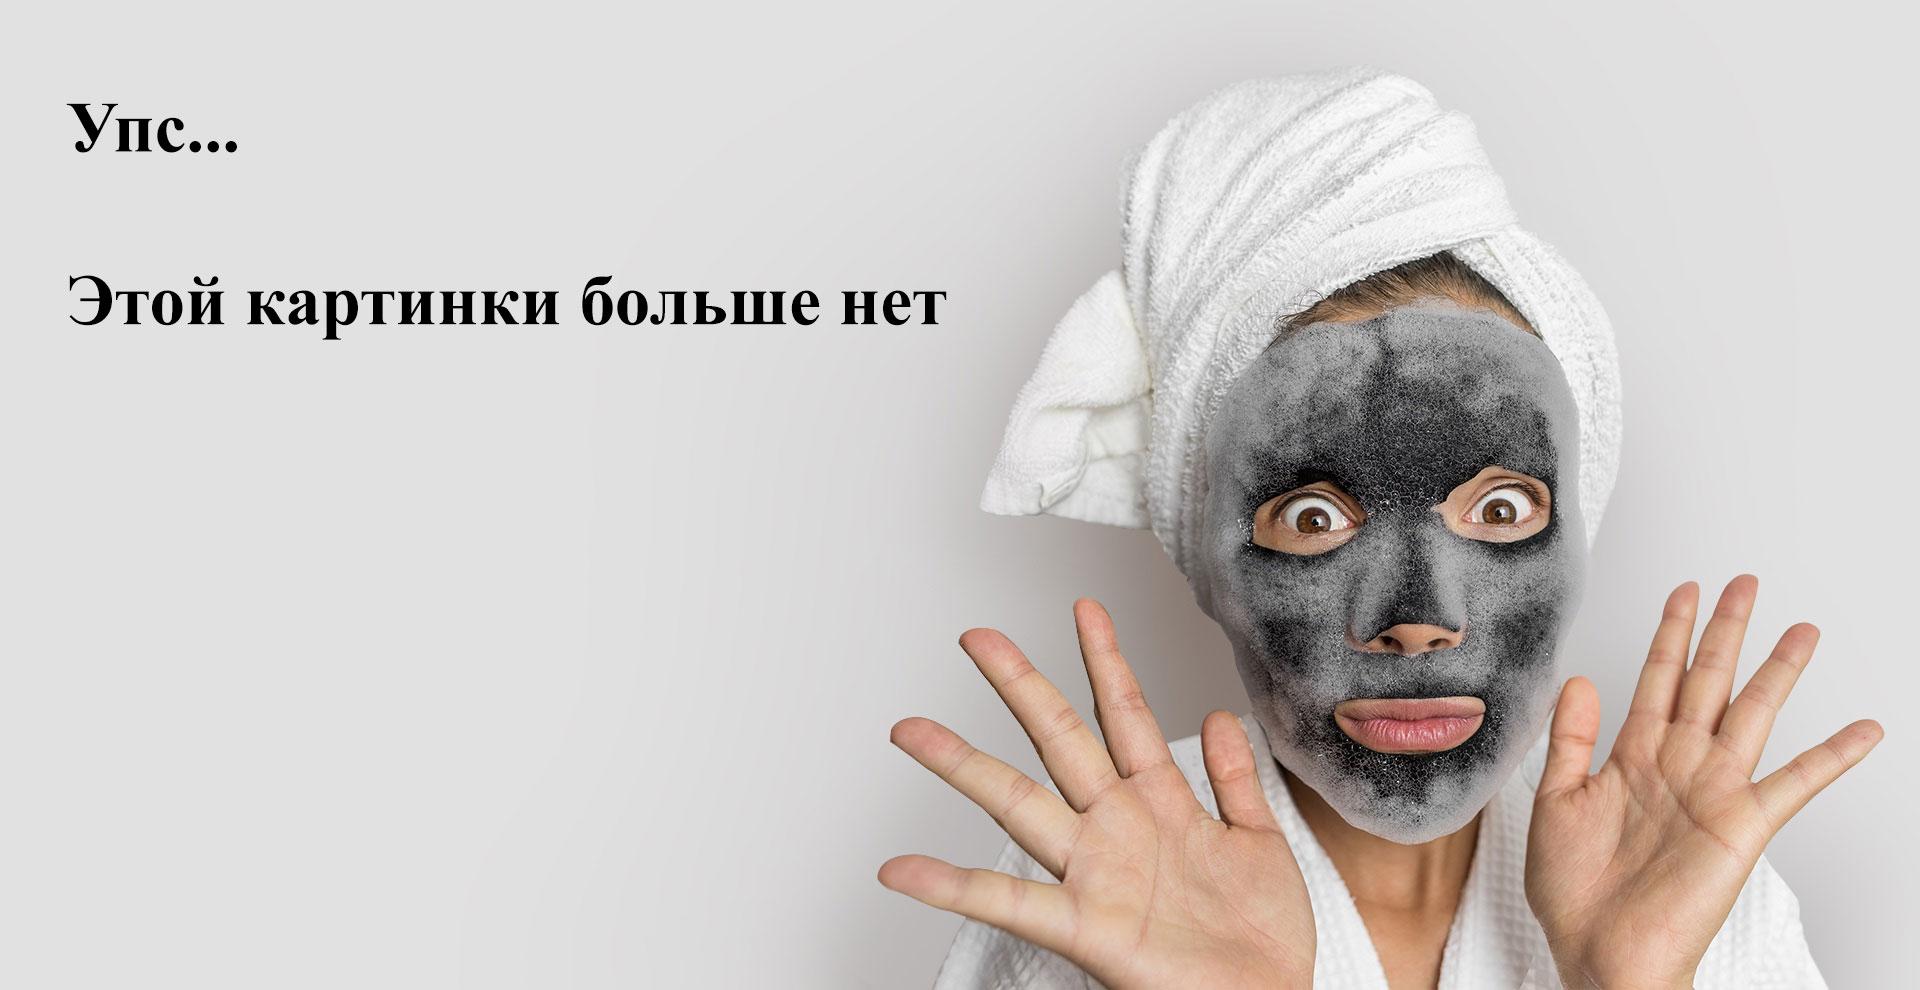 Patrisa Nail, Гель-лак Московская сага №755